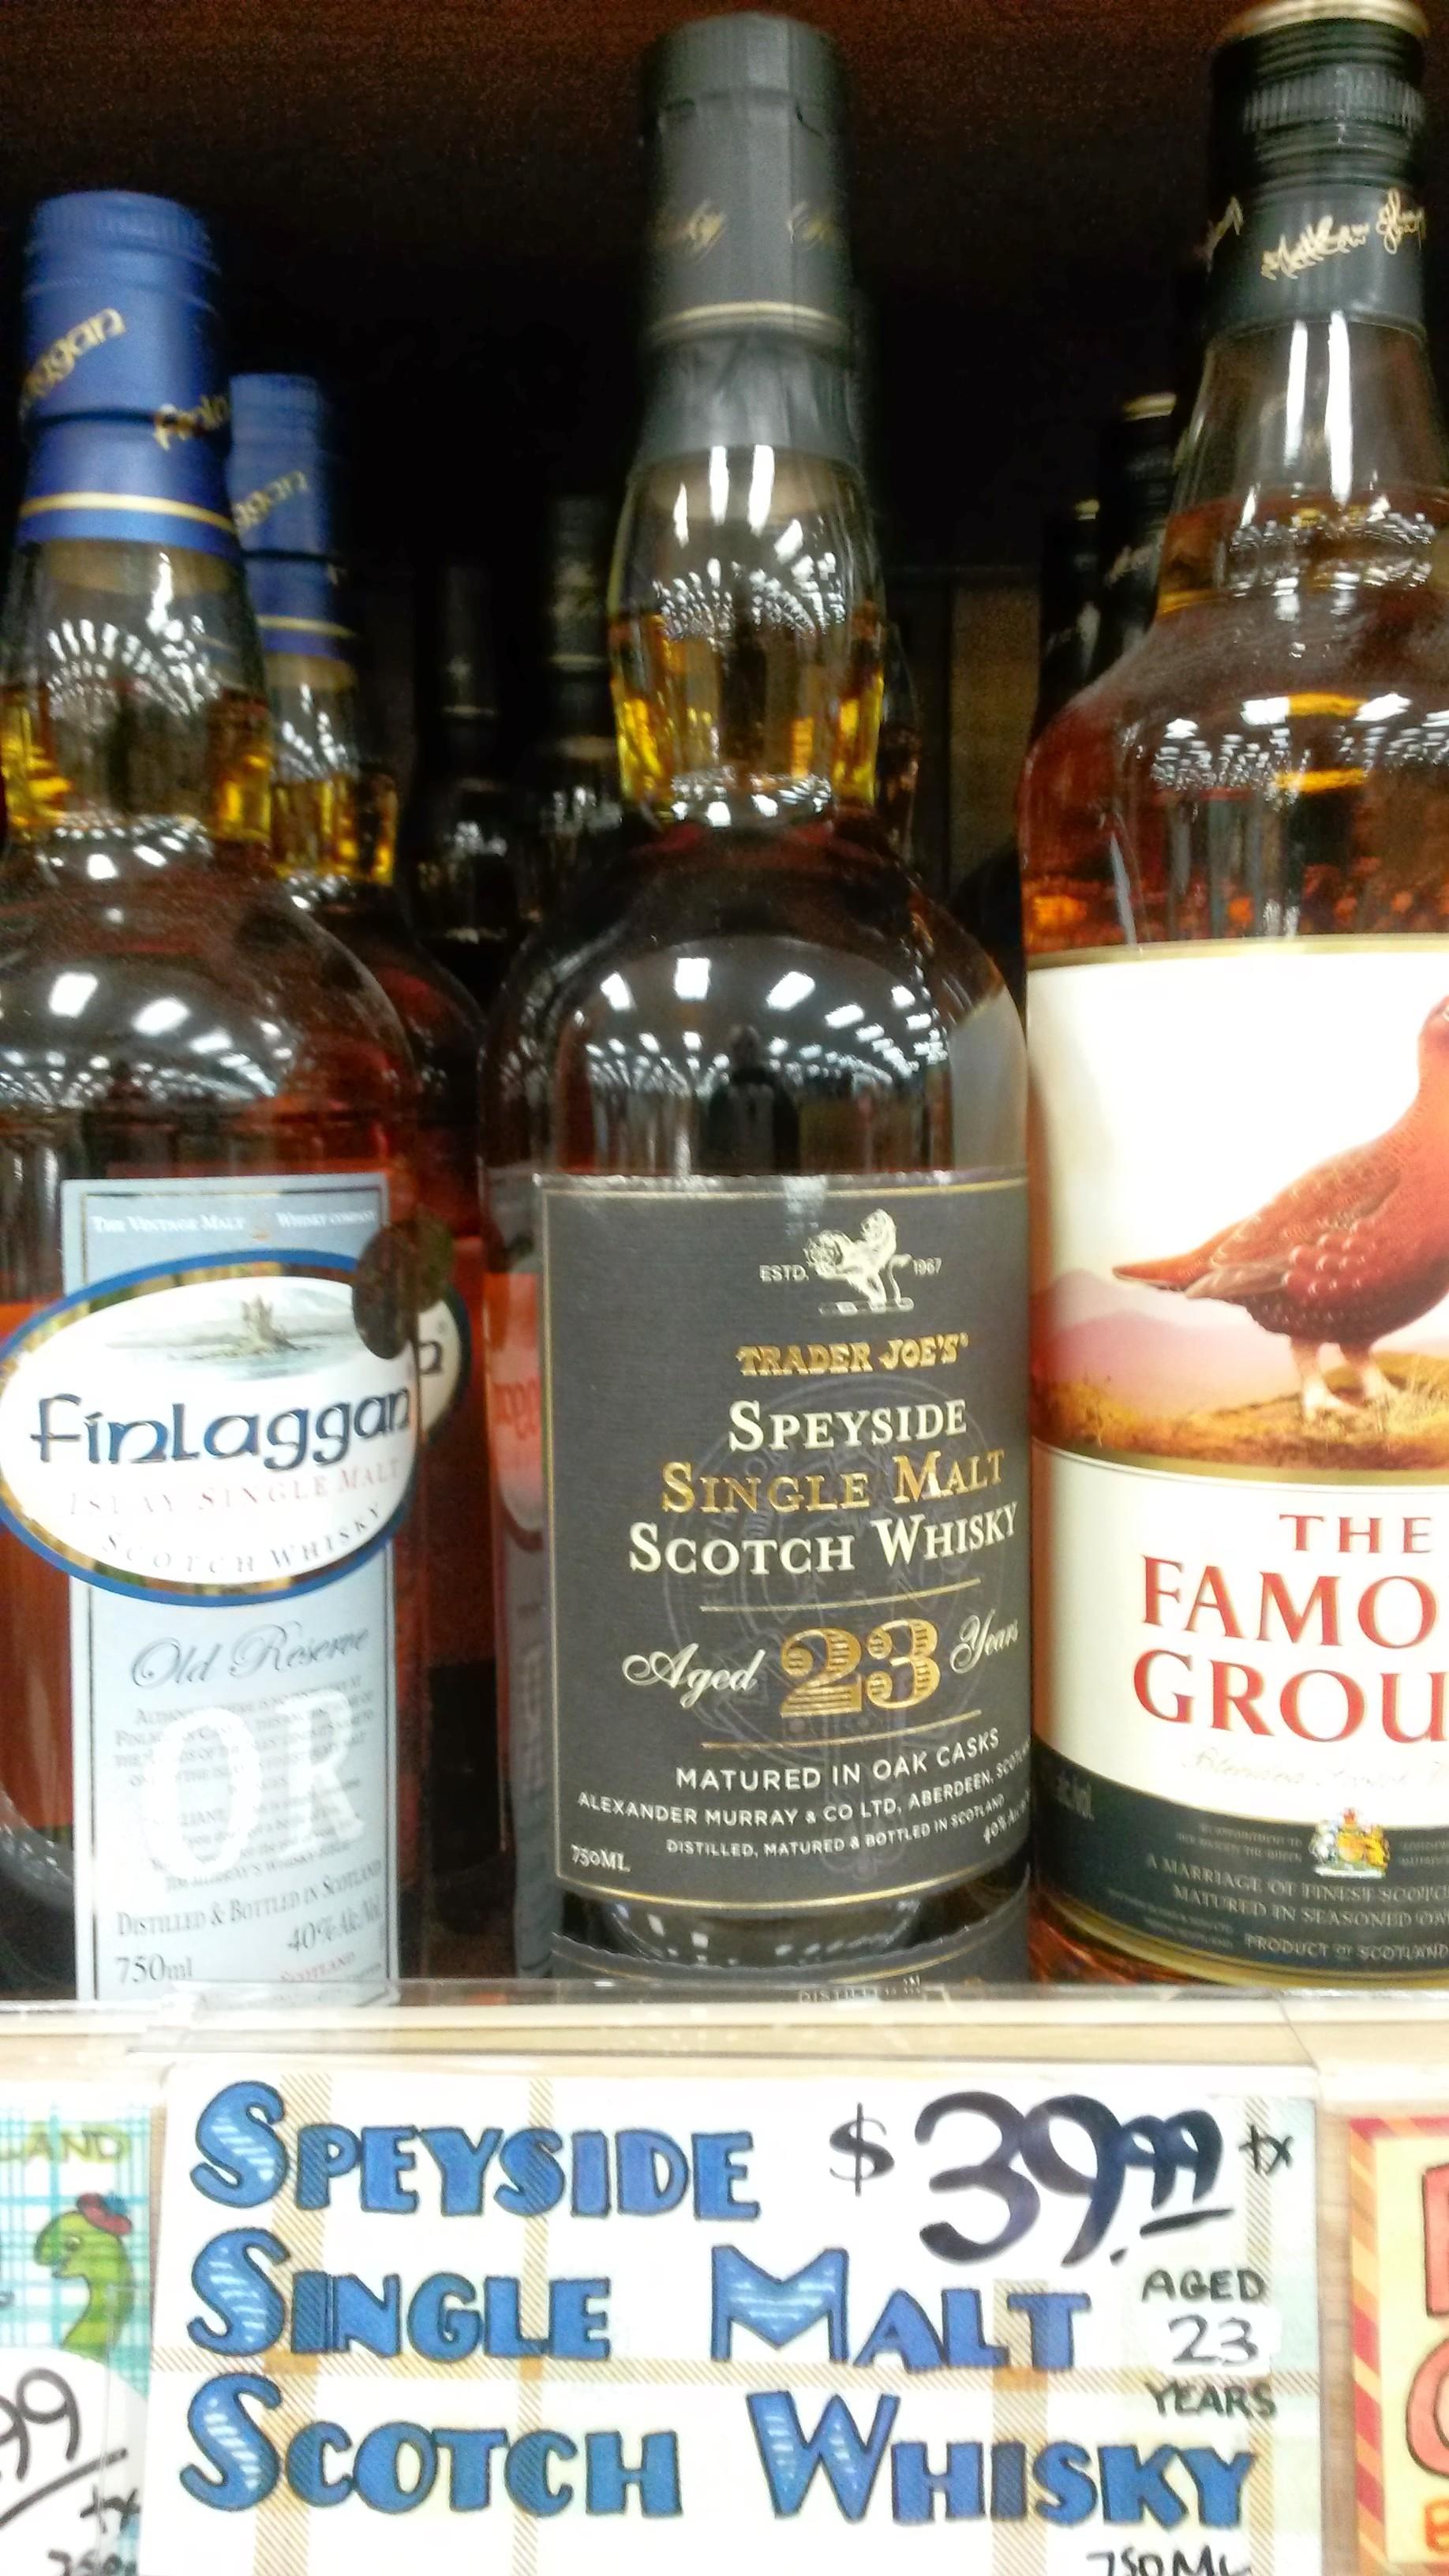 23 y.o. Speyside Single Malt Scotch Whisky - $39.99 at Trader Joe's (B&M)